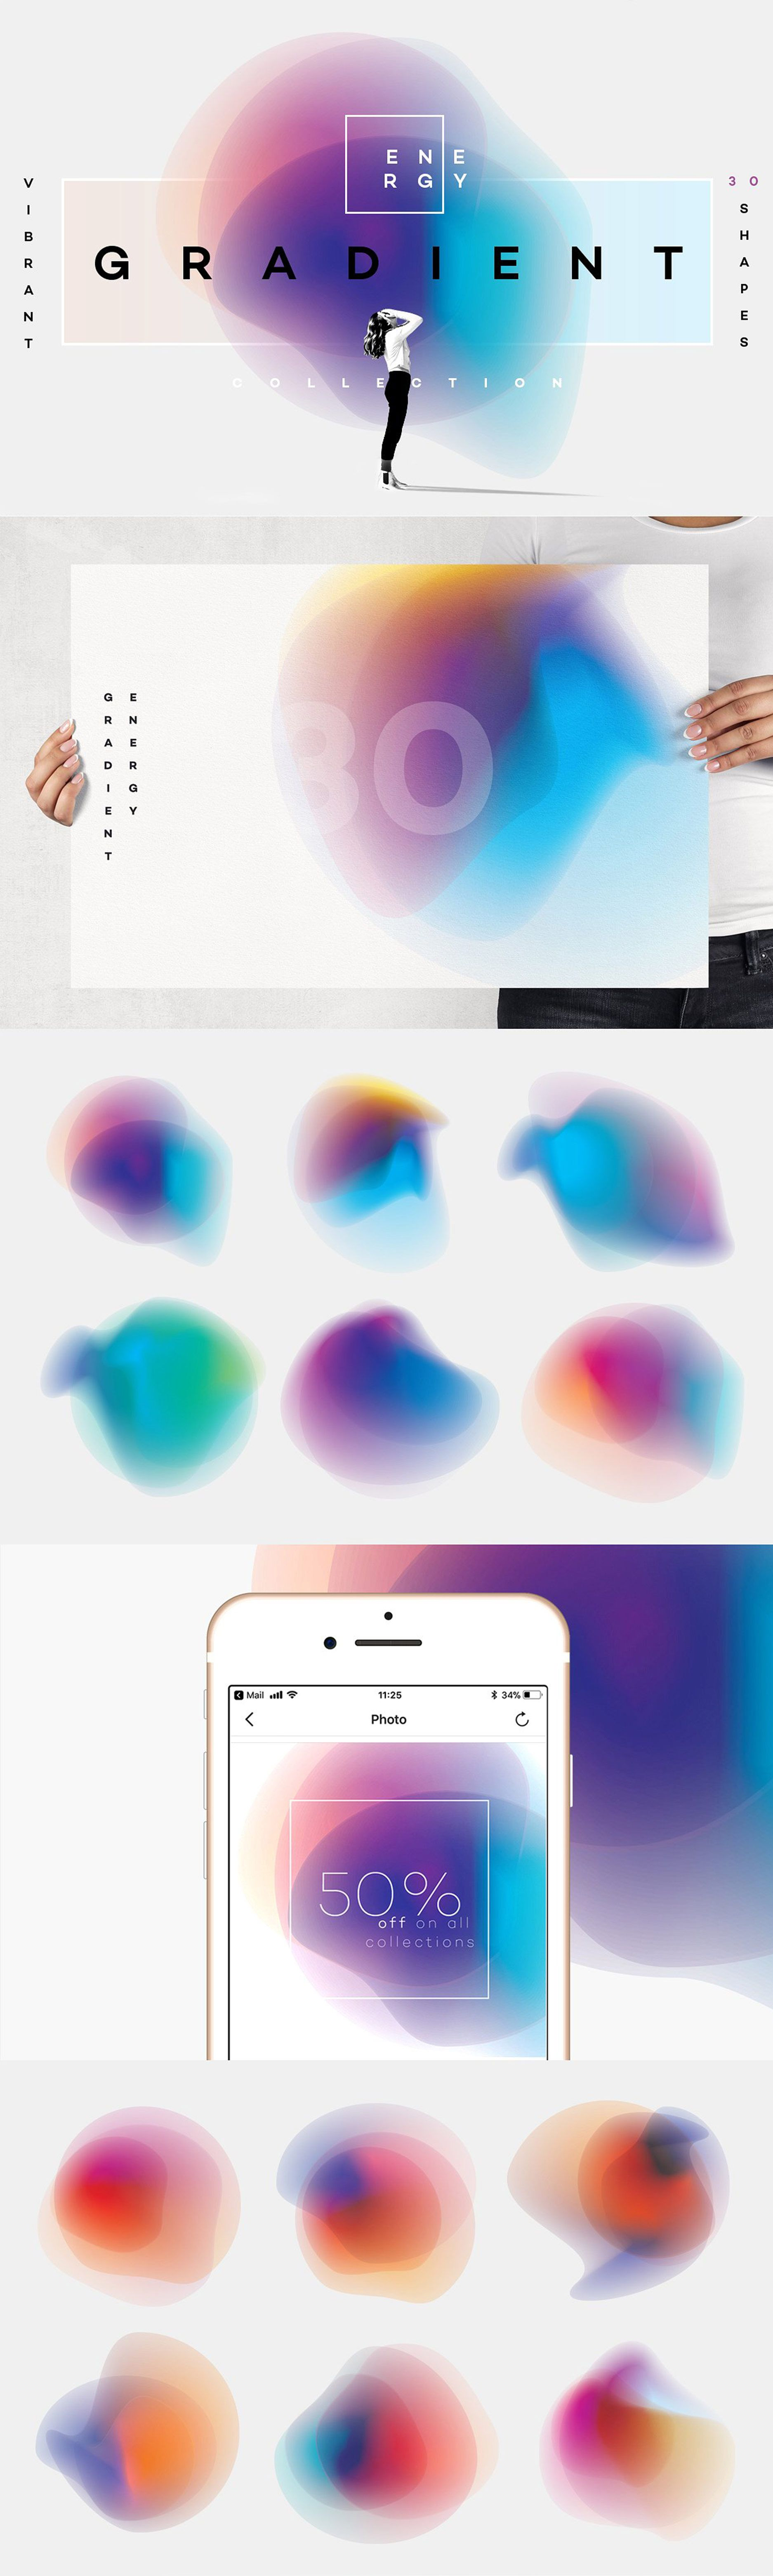 Gradient Energy  20 vibrant shapes   Raster image, Shapes, Vibrant